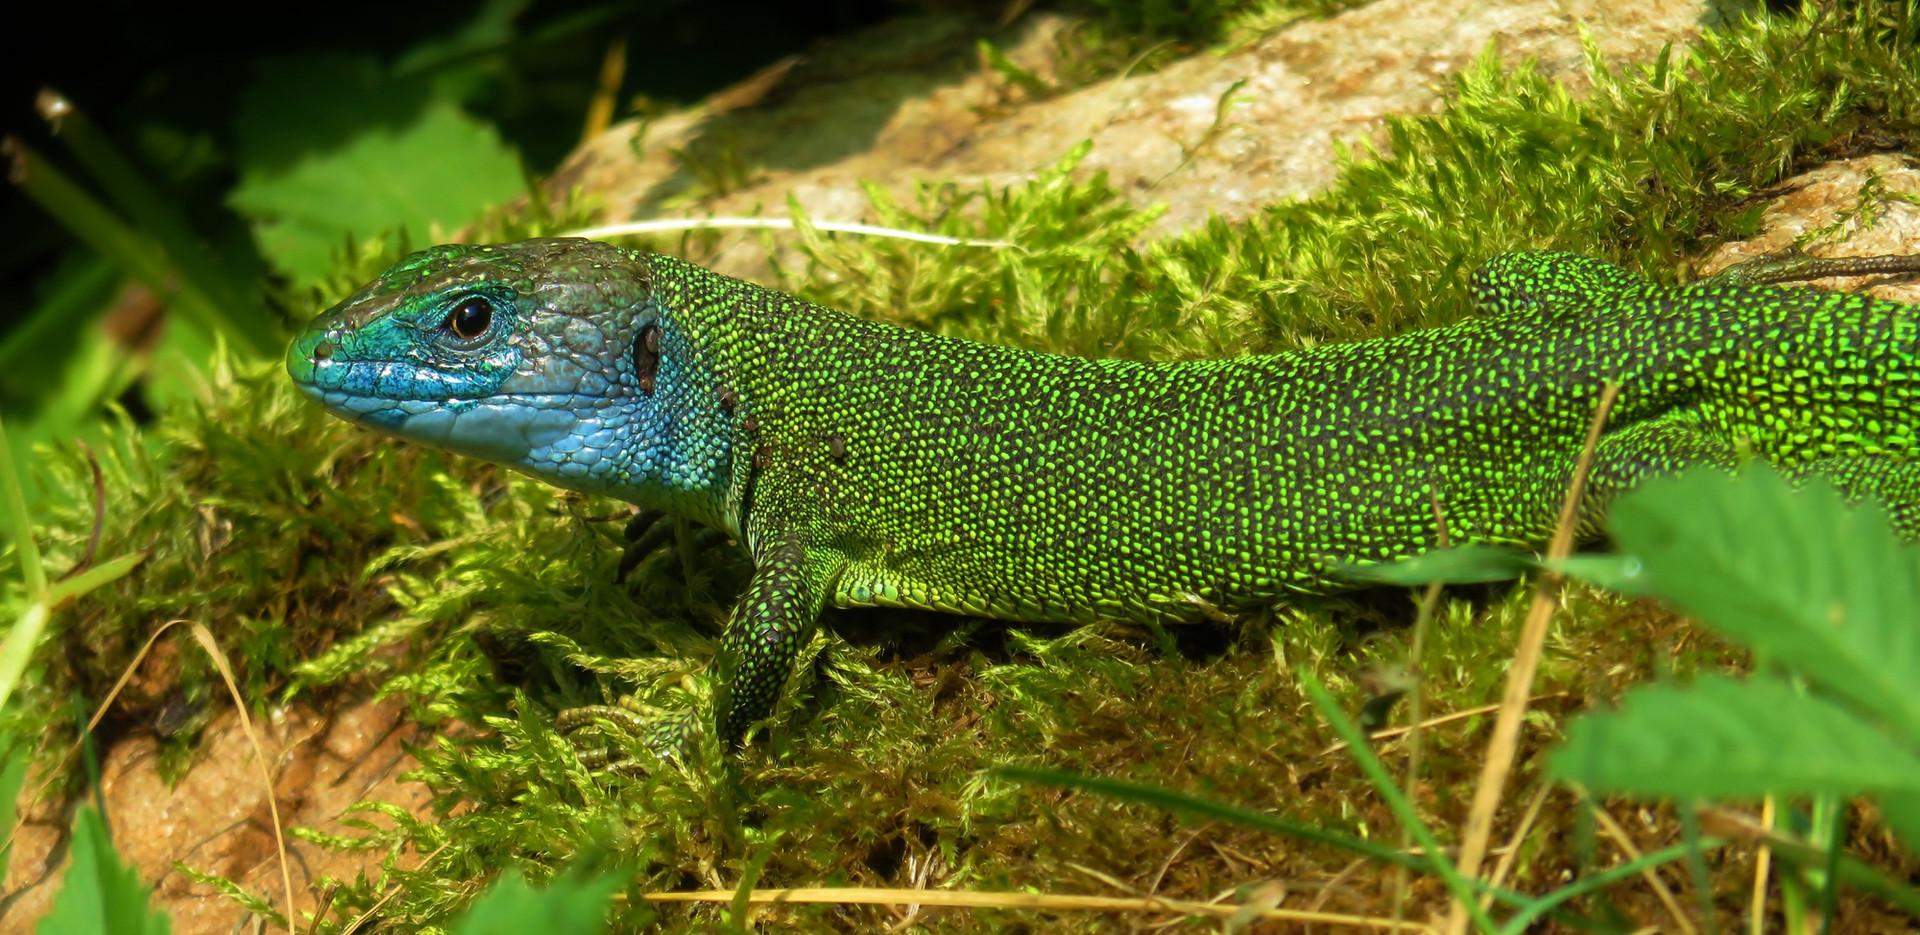 western green lizard (lacerta bilineata), adult male, Ticino, June 2015.jpg